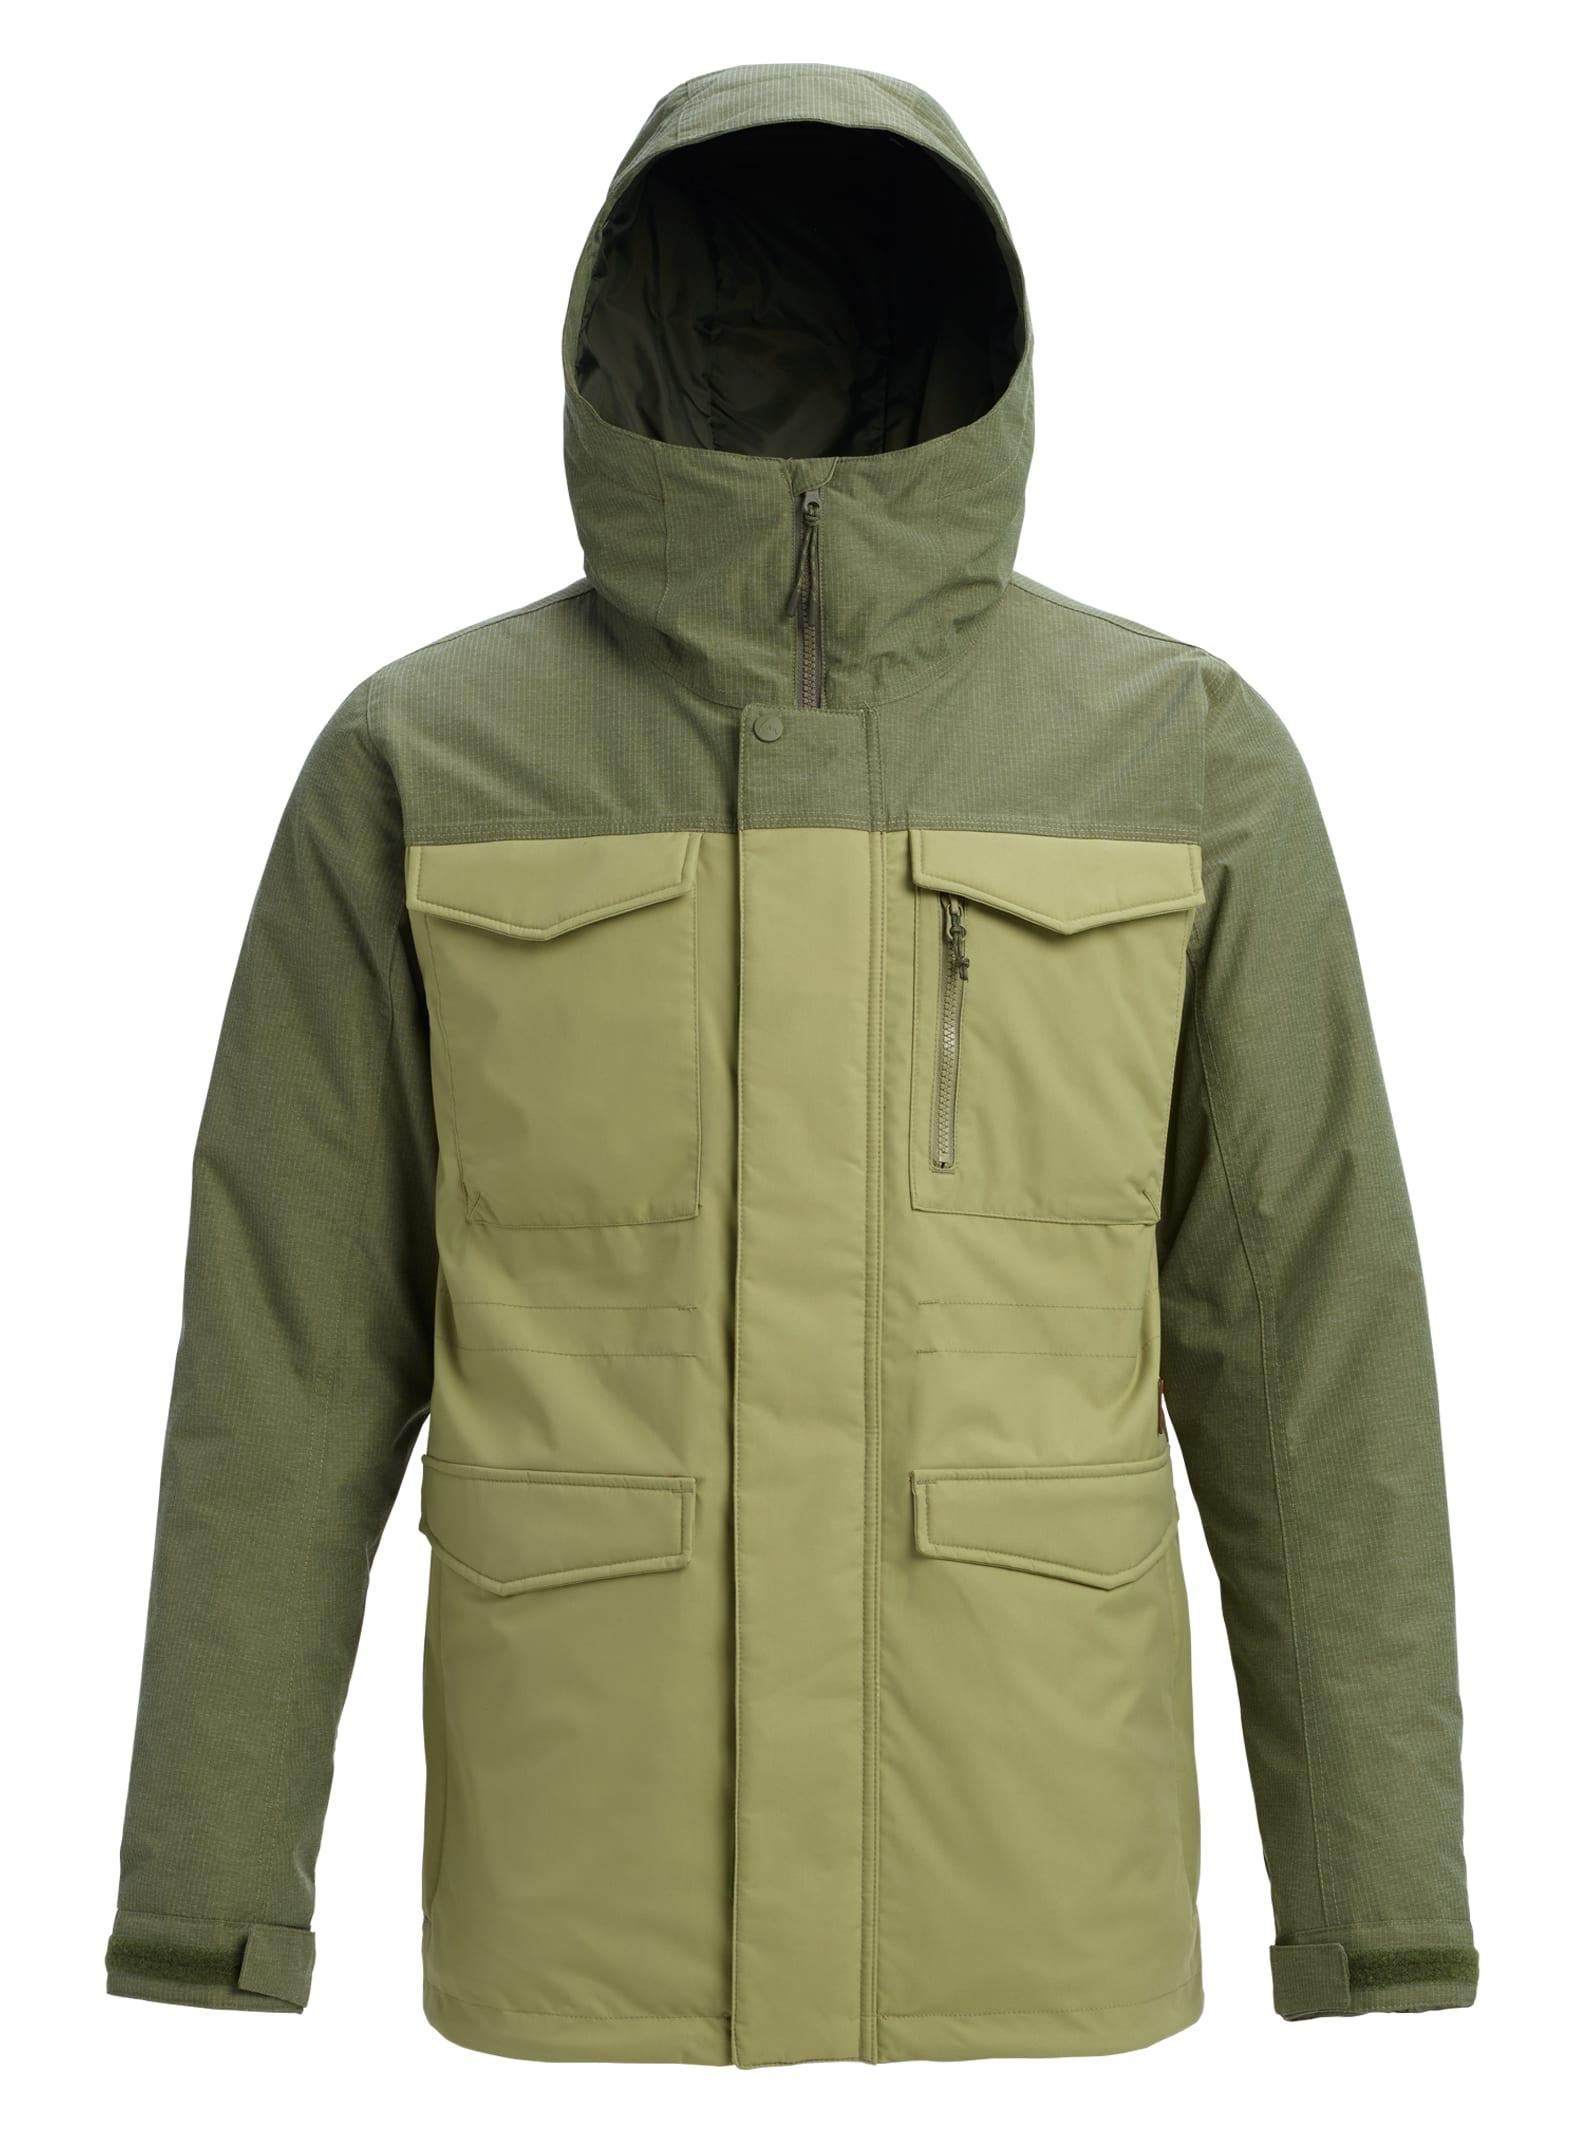 Welton Burton Anorak Streetwear Jacket Blue Vestes xdnY7qPn